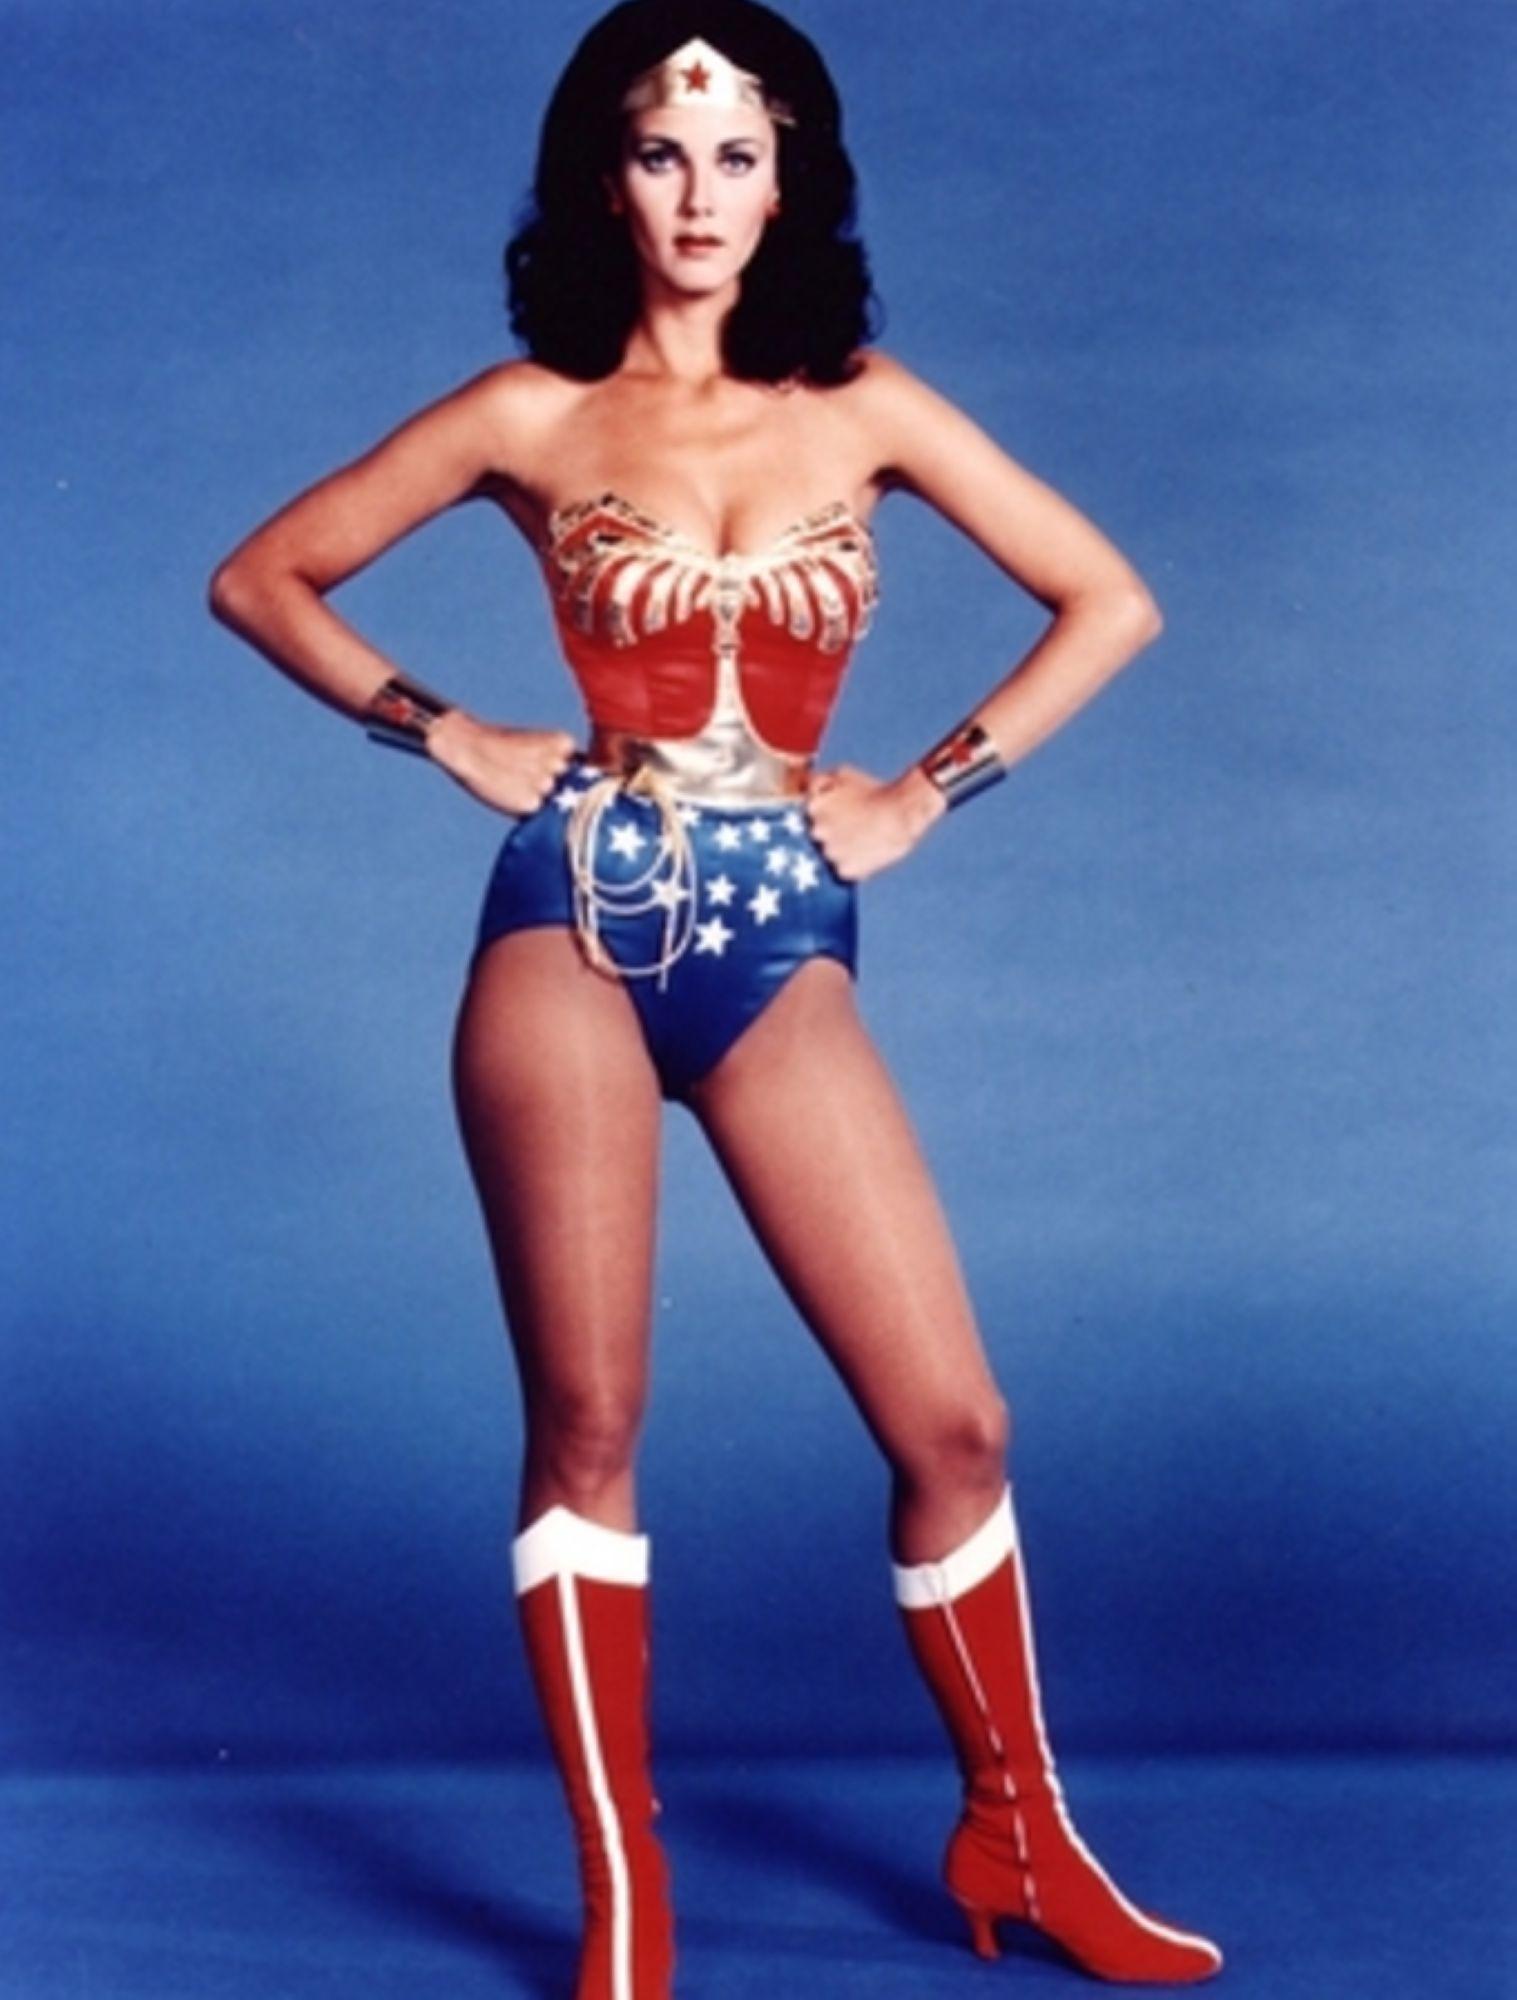 06-Lynda-Carter-Wonder-Woman.jpg